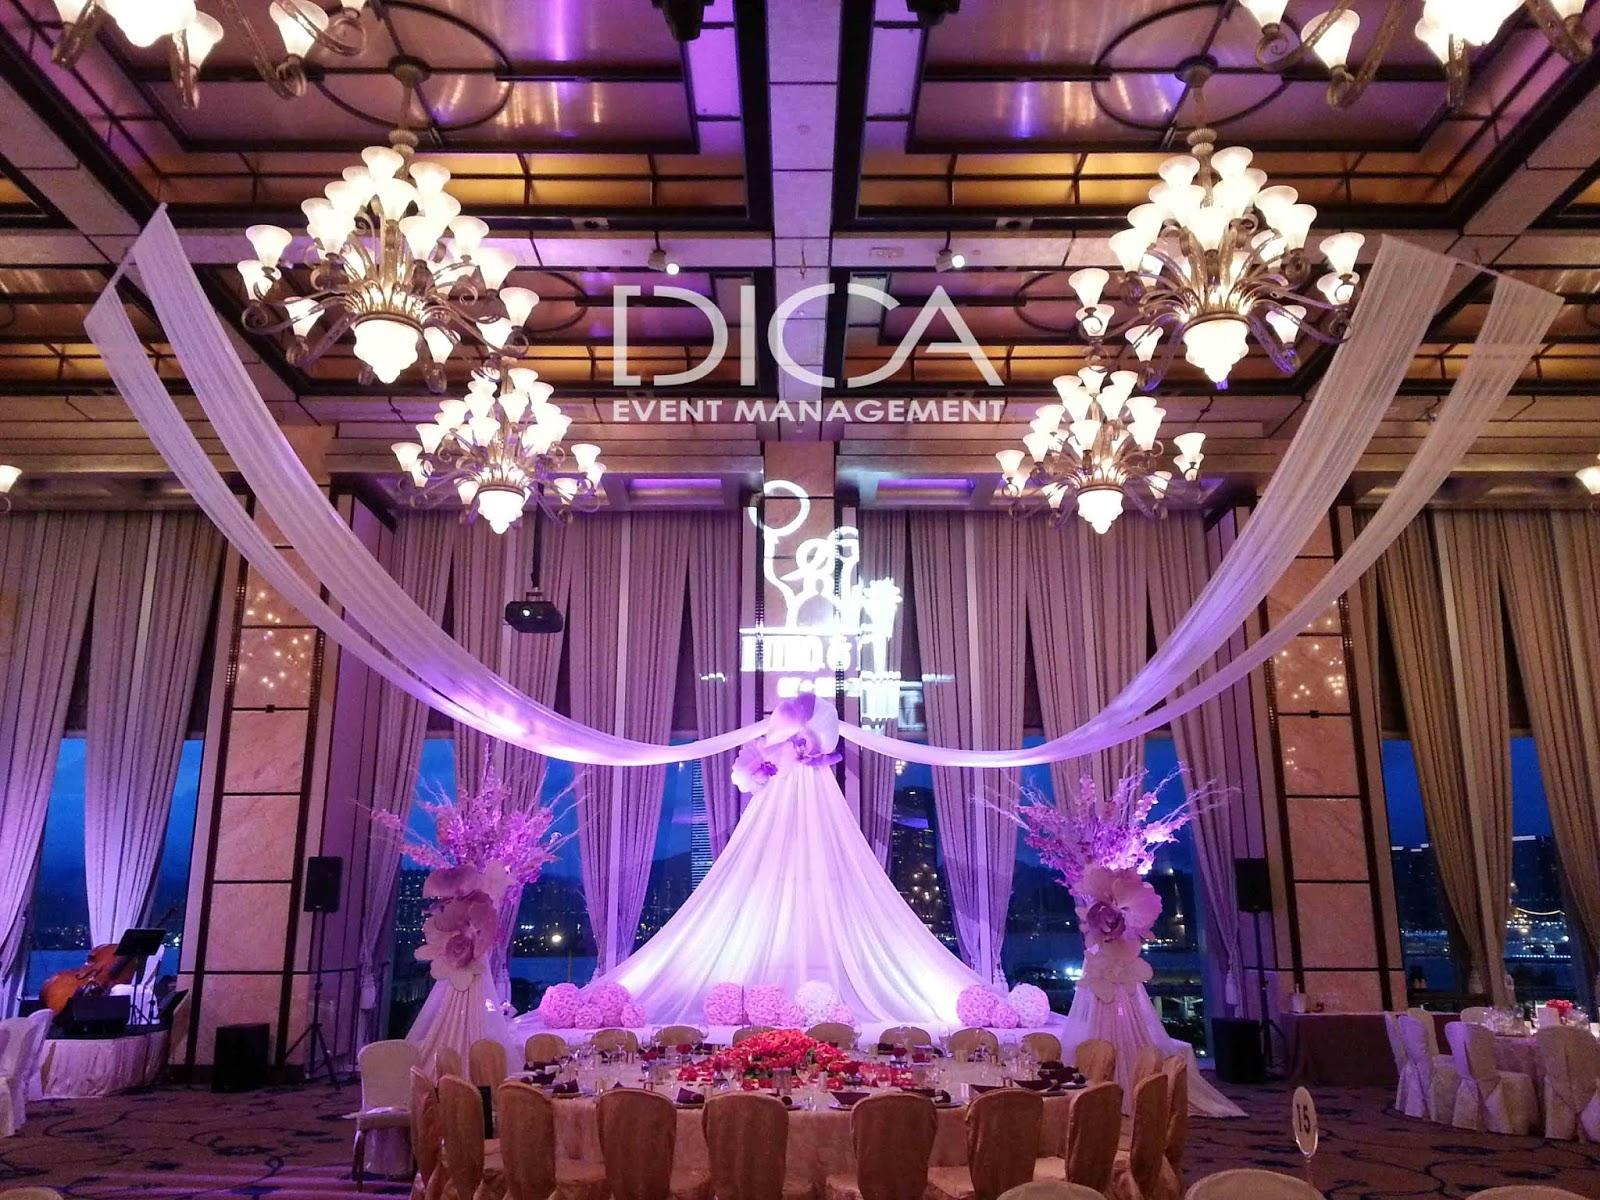 Dica wedding decoration dica event wedding decoration four dica event wedding decoration four seasons hotel hong kong junglespirit Images